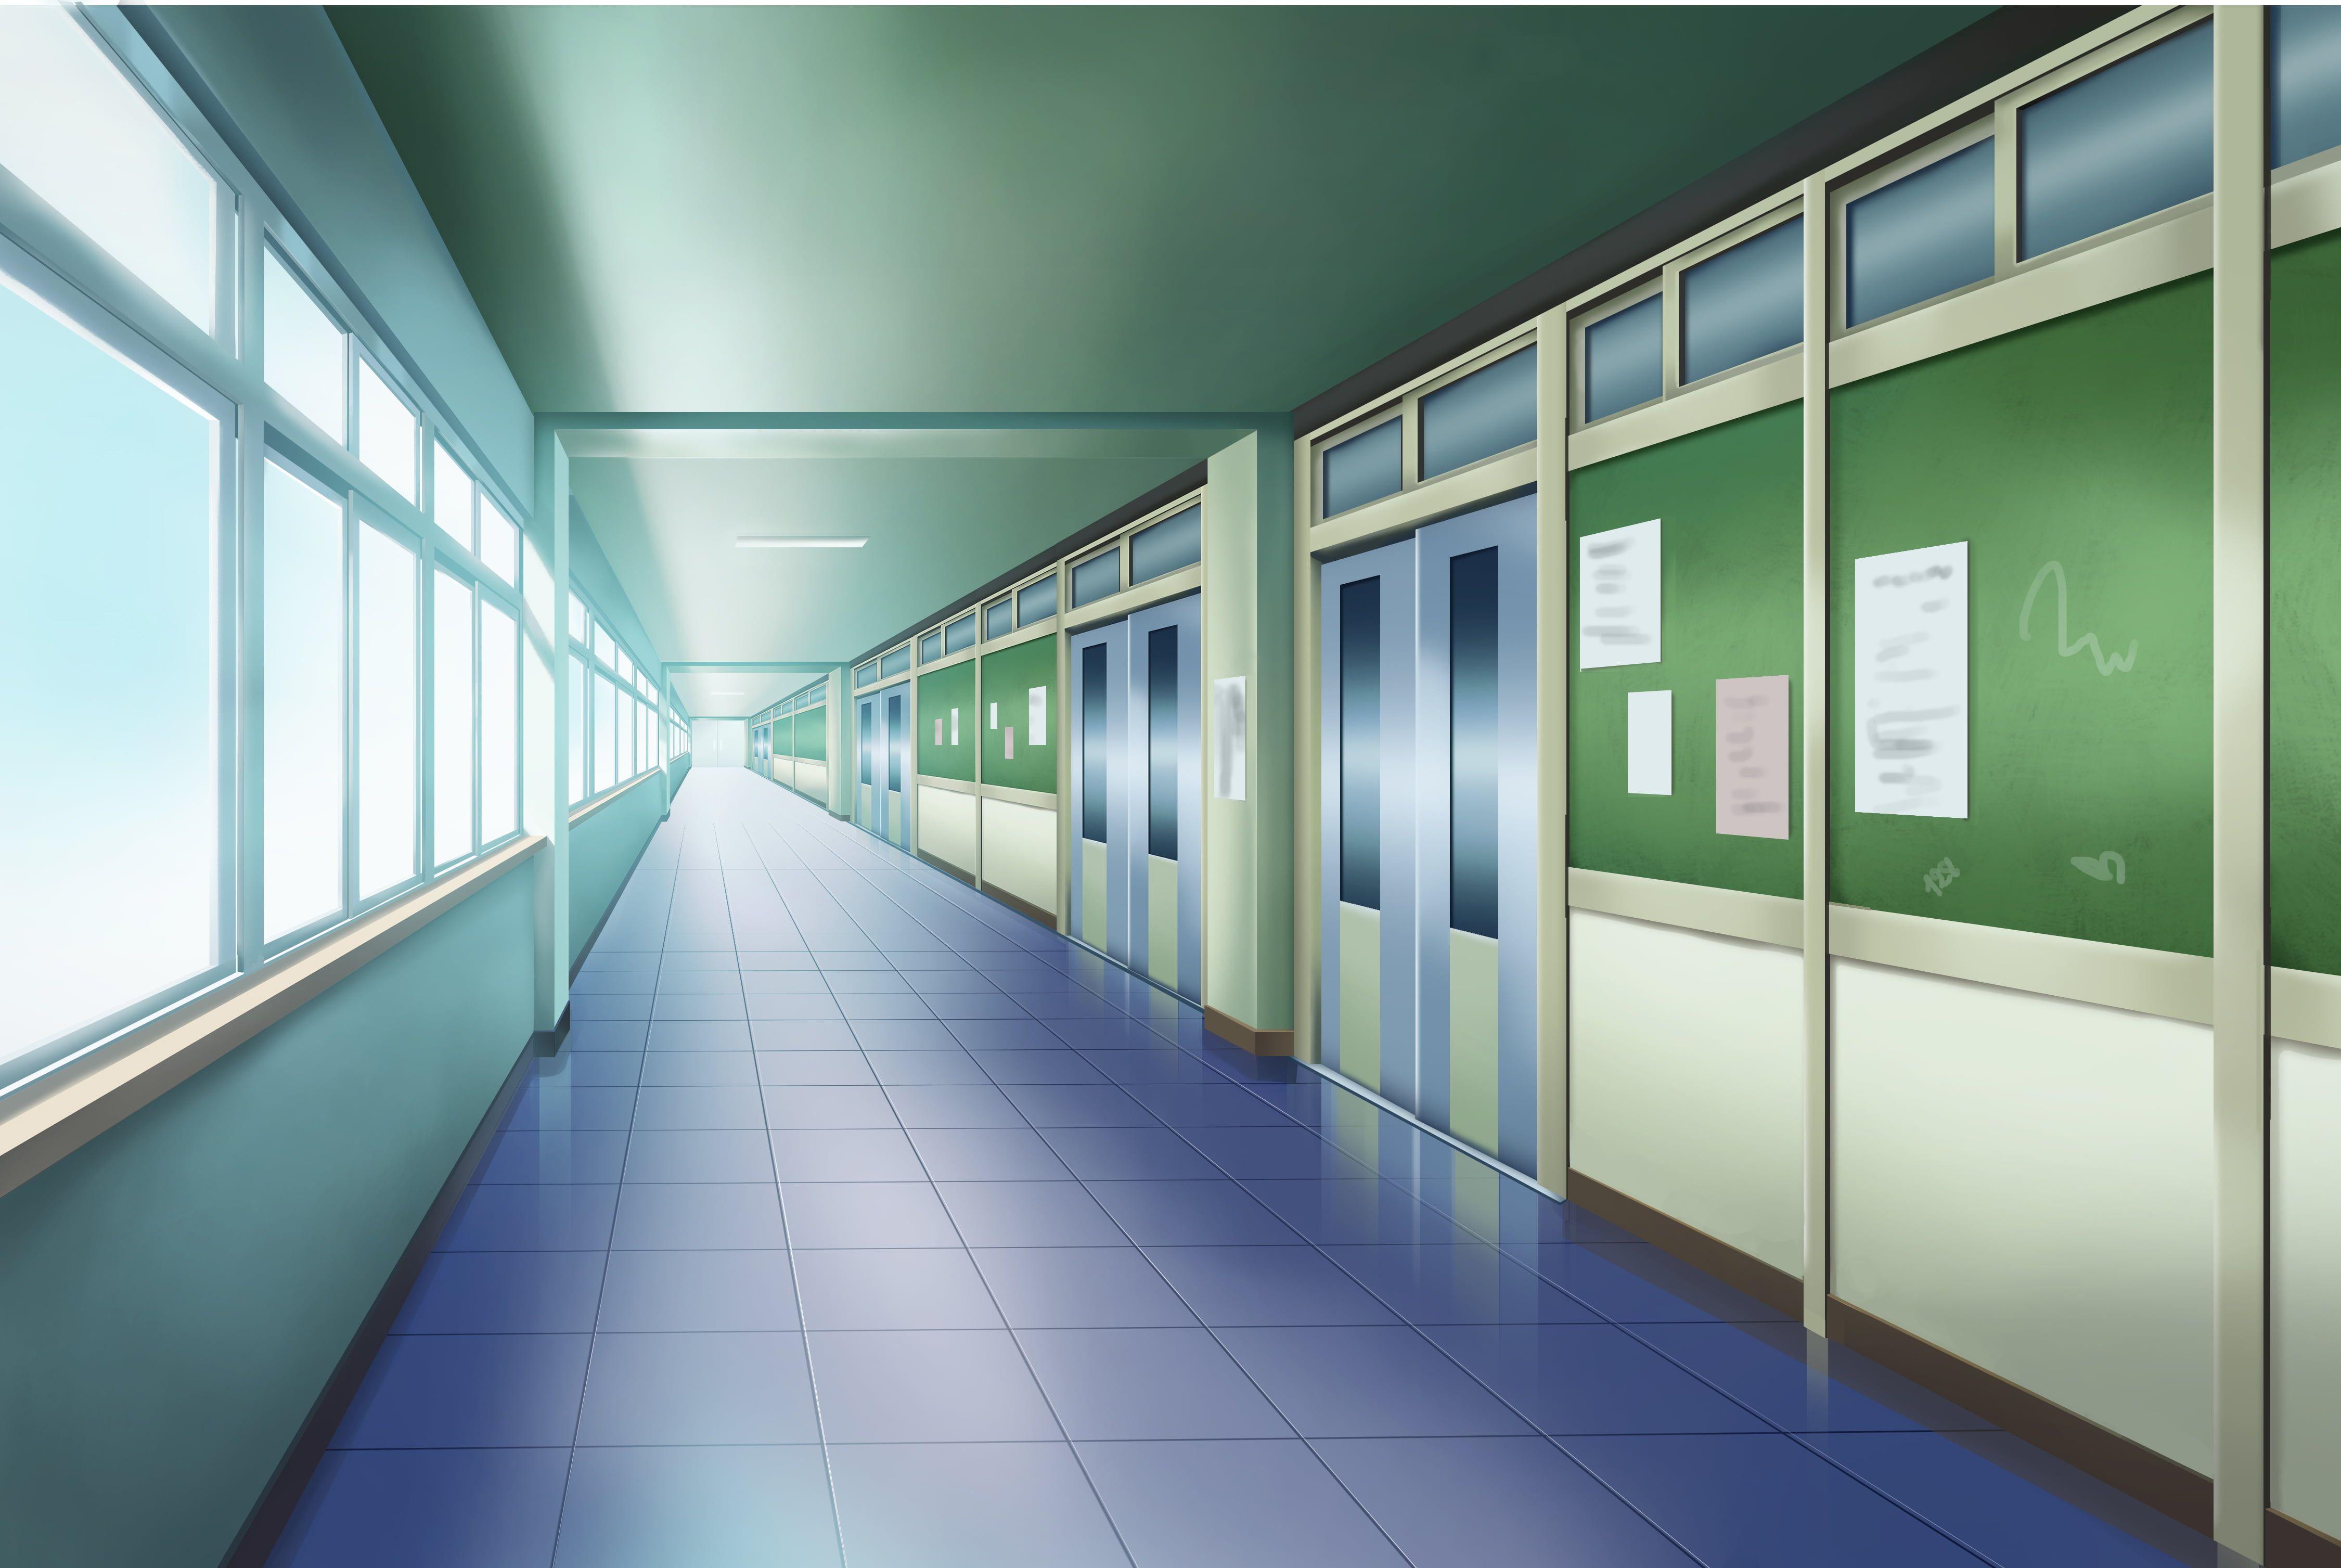 HD wallpaper: Anime, Original, Hallway, School